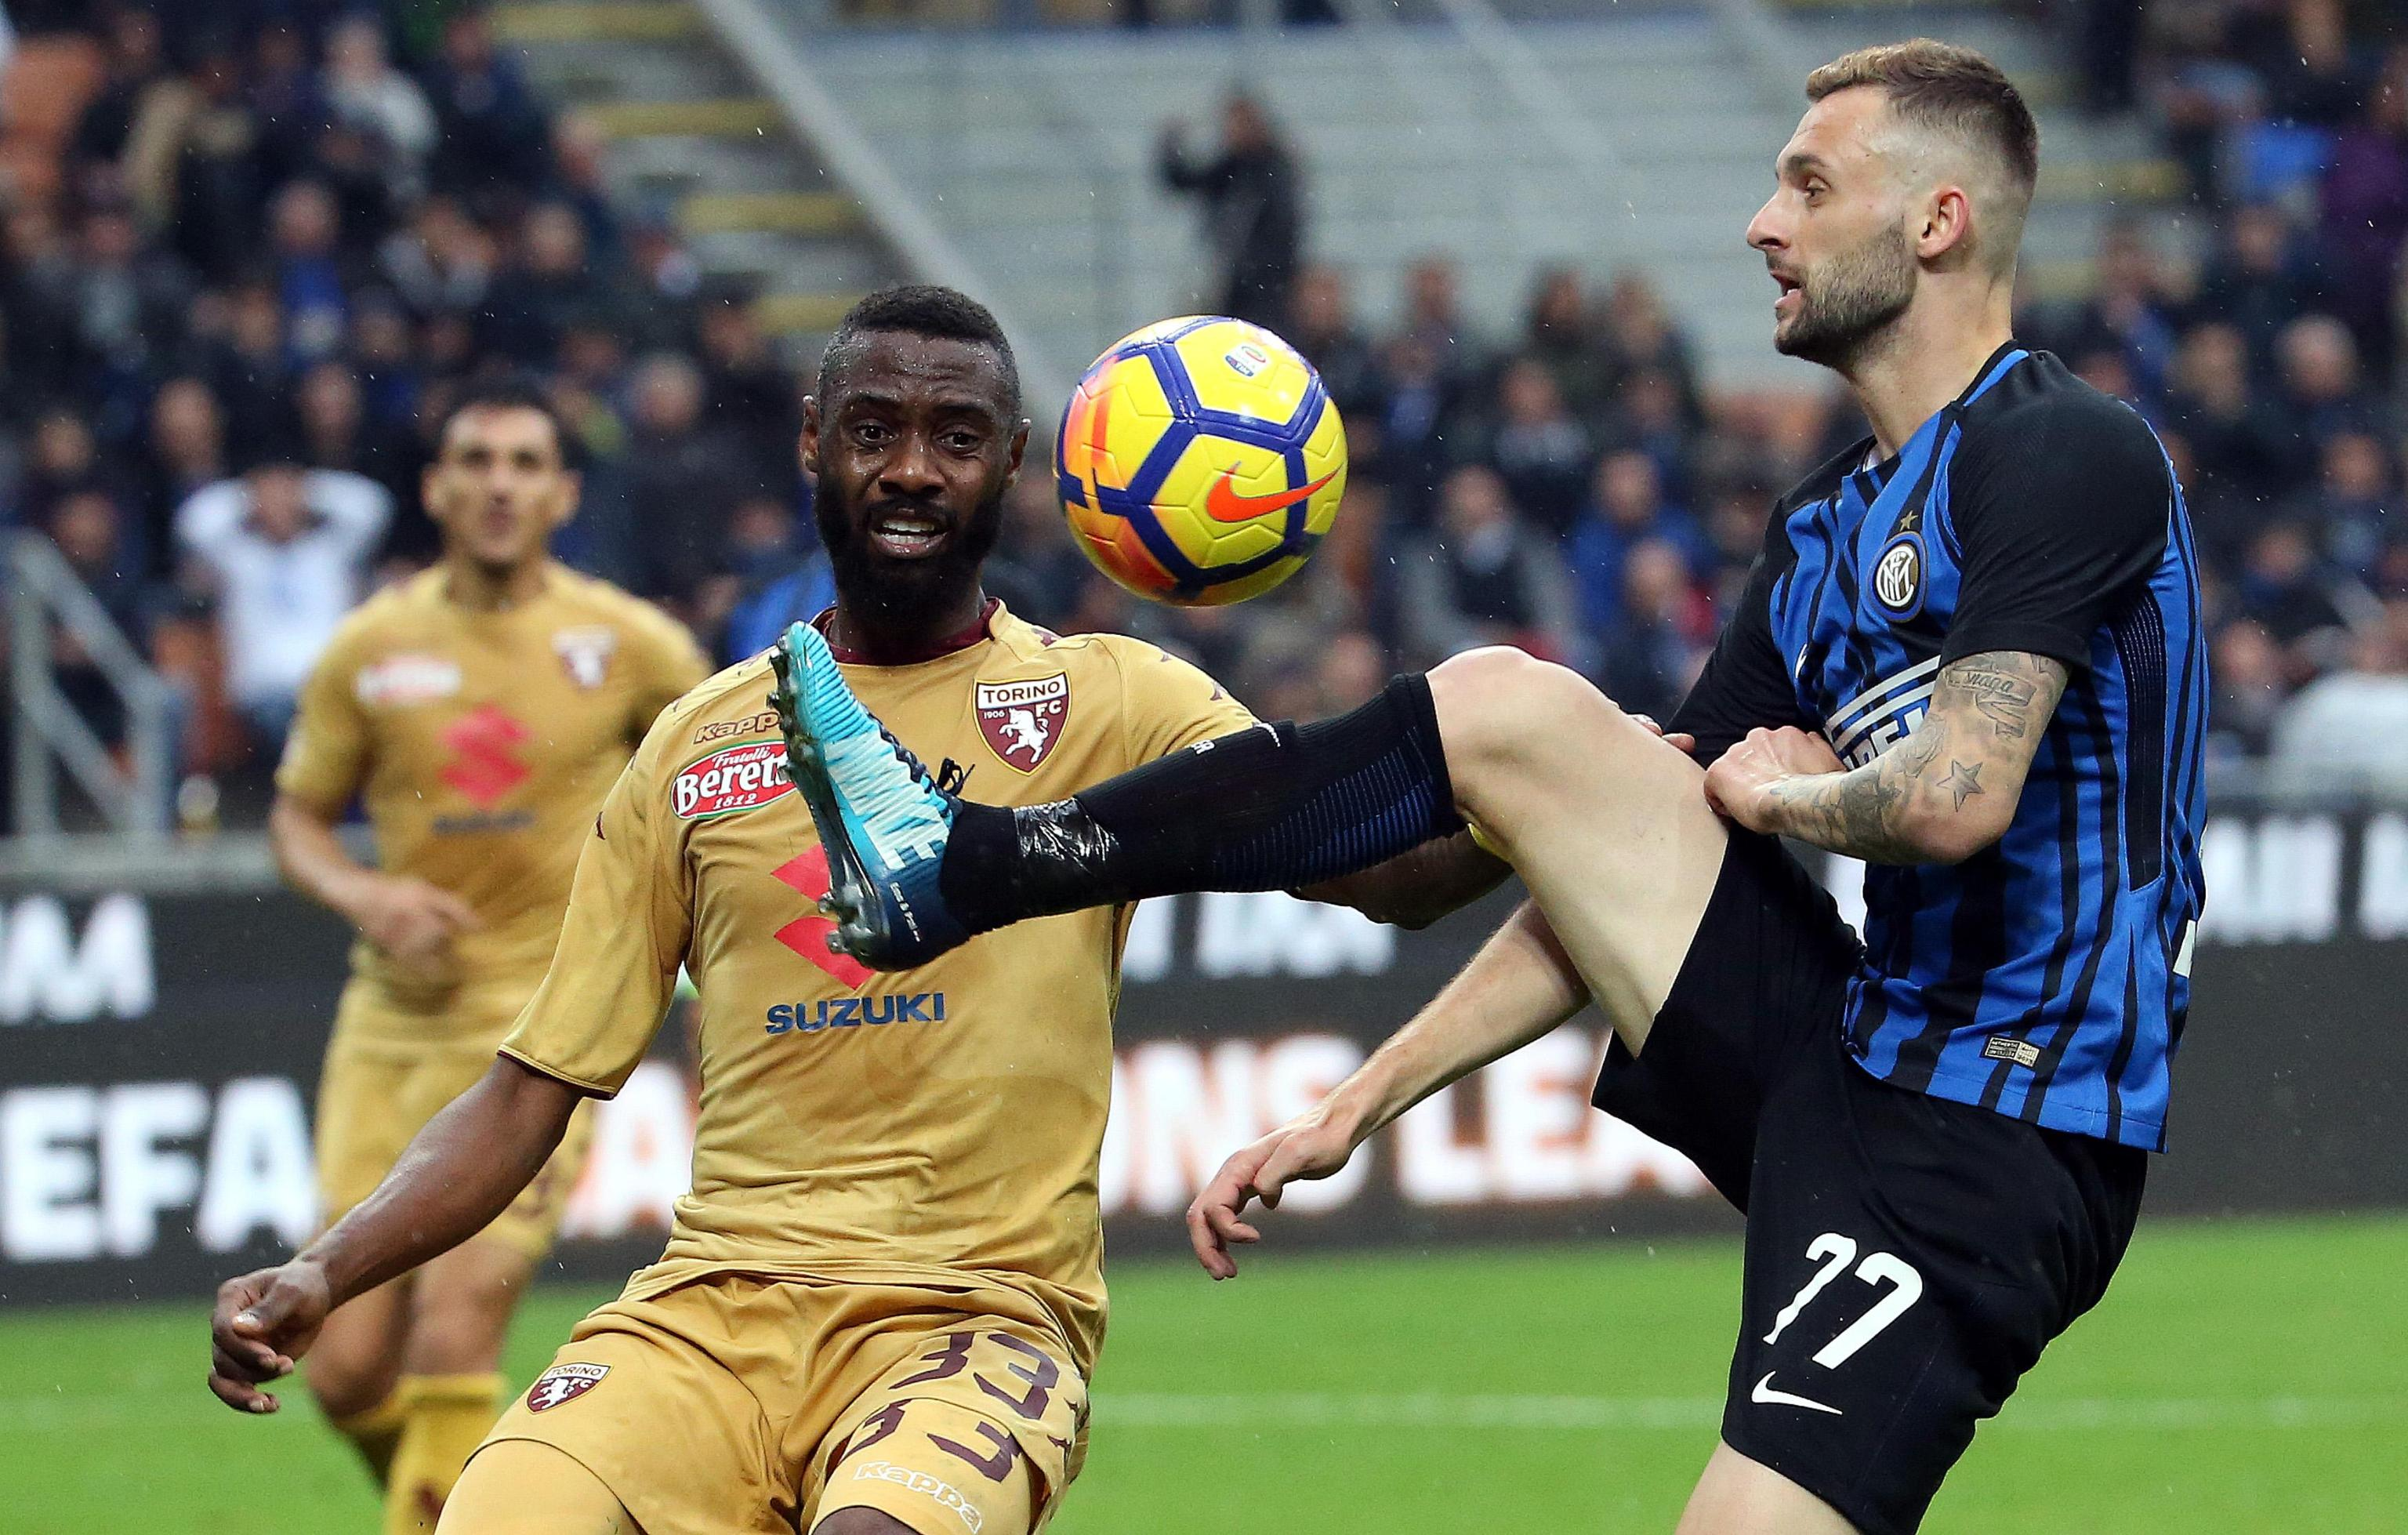 Serie A, 24 mila media spettatori stadi